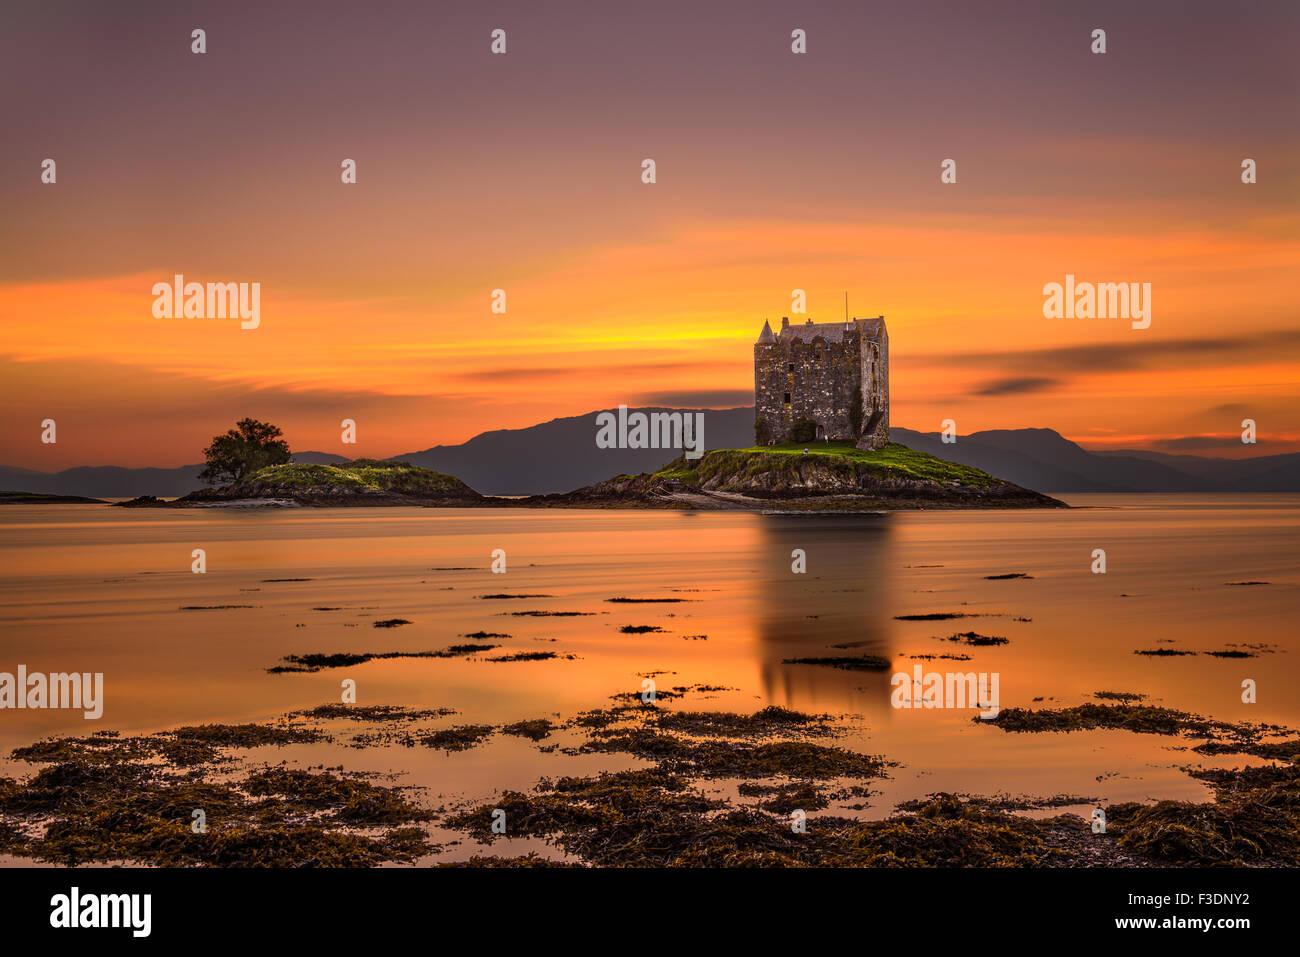 Sunset over Castle Stalker, Highlands, Scotland, United Kingdom. Long exposure and hdr processed. - Stock Image